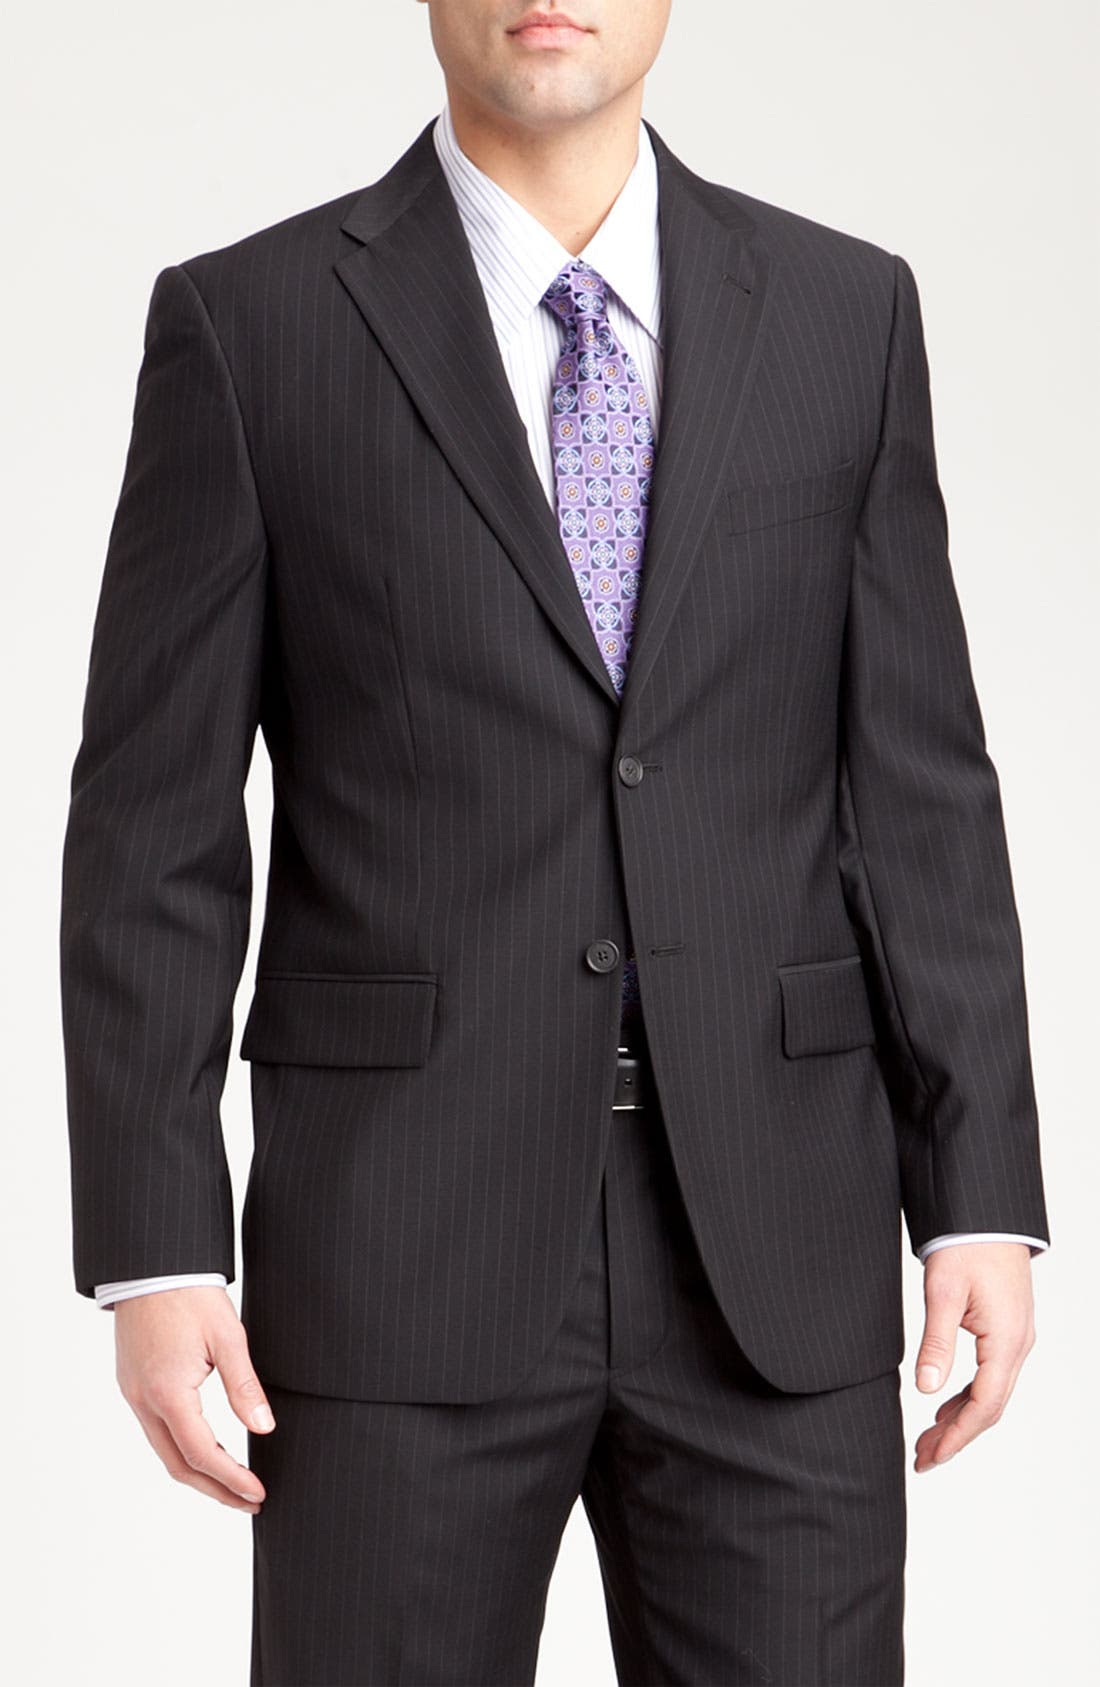 Alternate Image 1 Selected - Joseph Abboud Two Button Stripe Suit